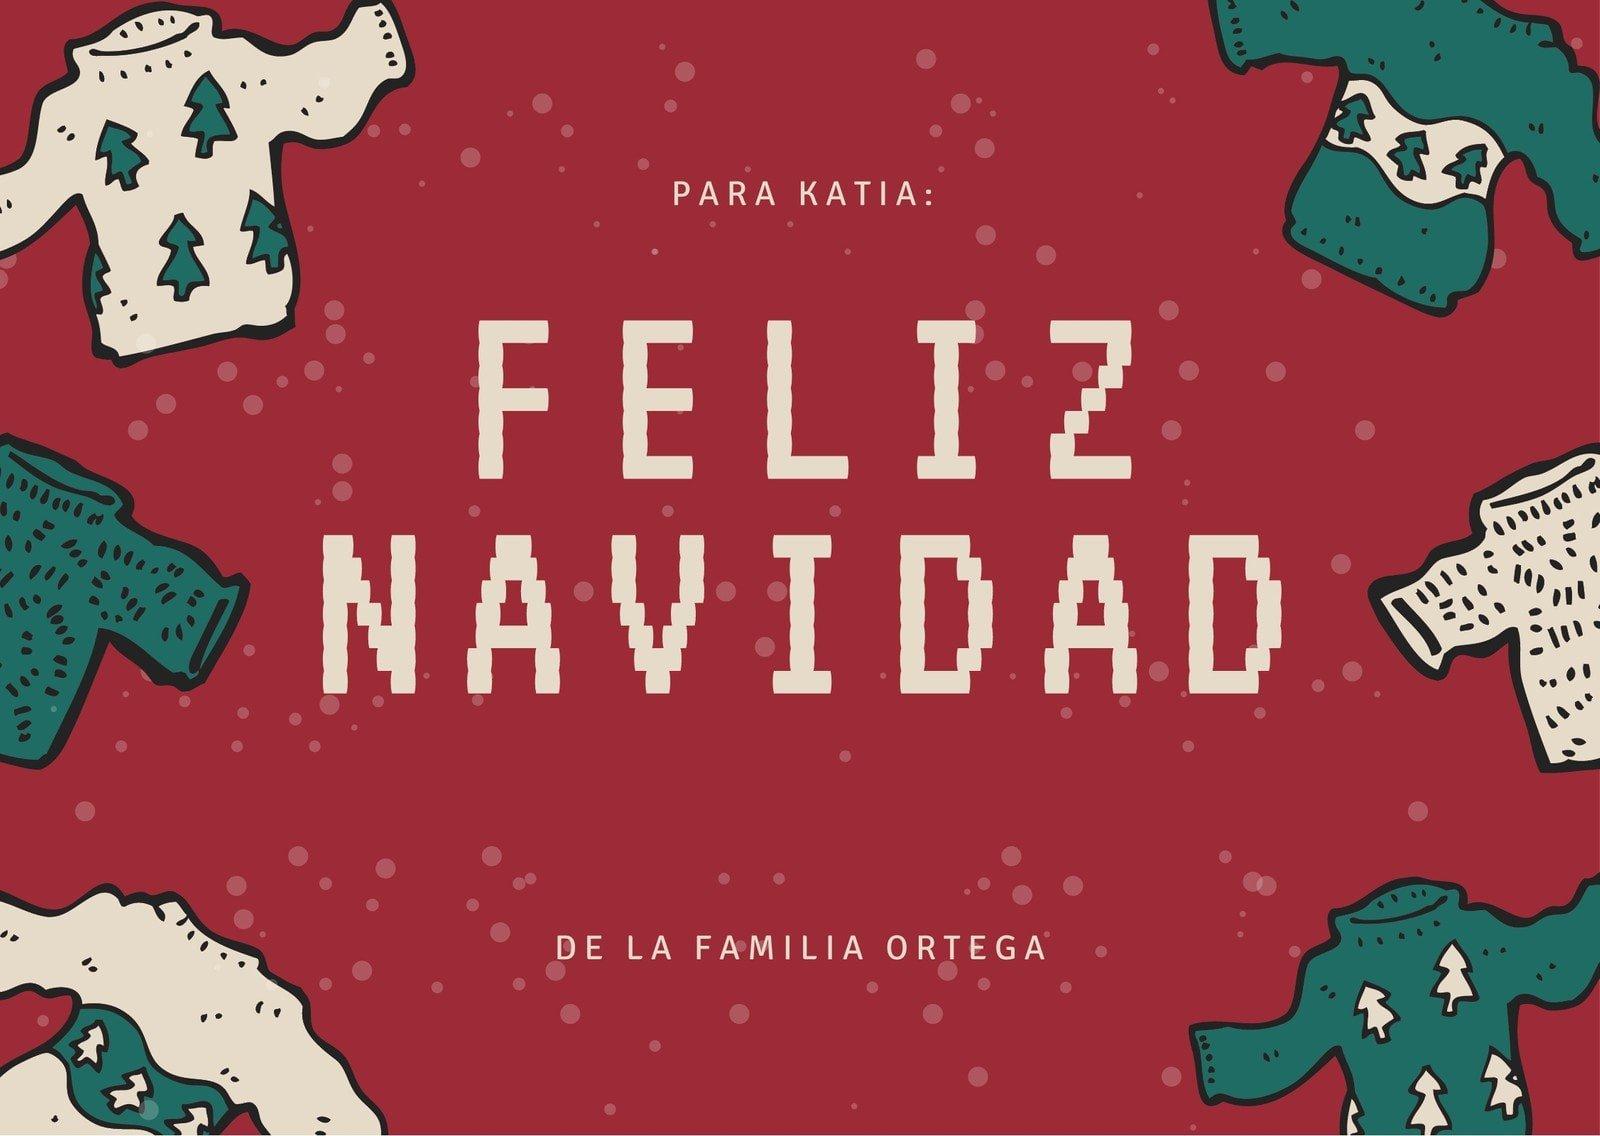 Rojo Navidad Ilustrada Suéter Arte Navideño Tarjeta